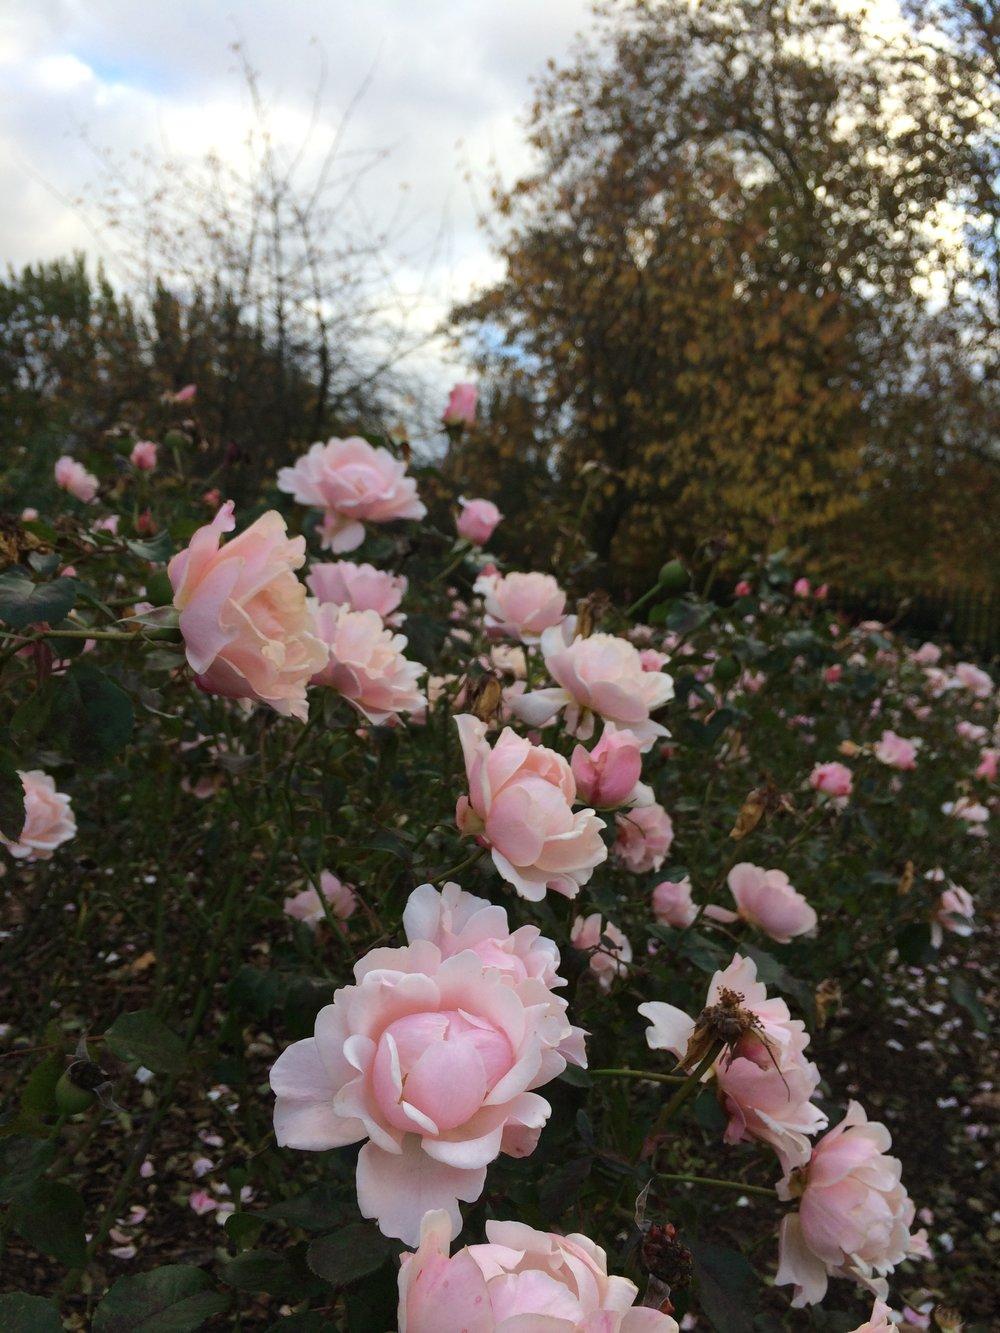 regents-park-primrose-hill-roses